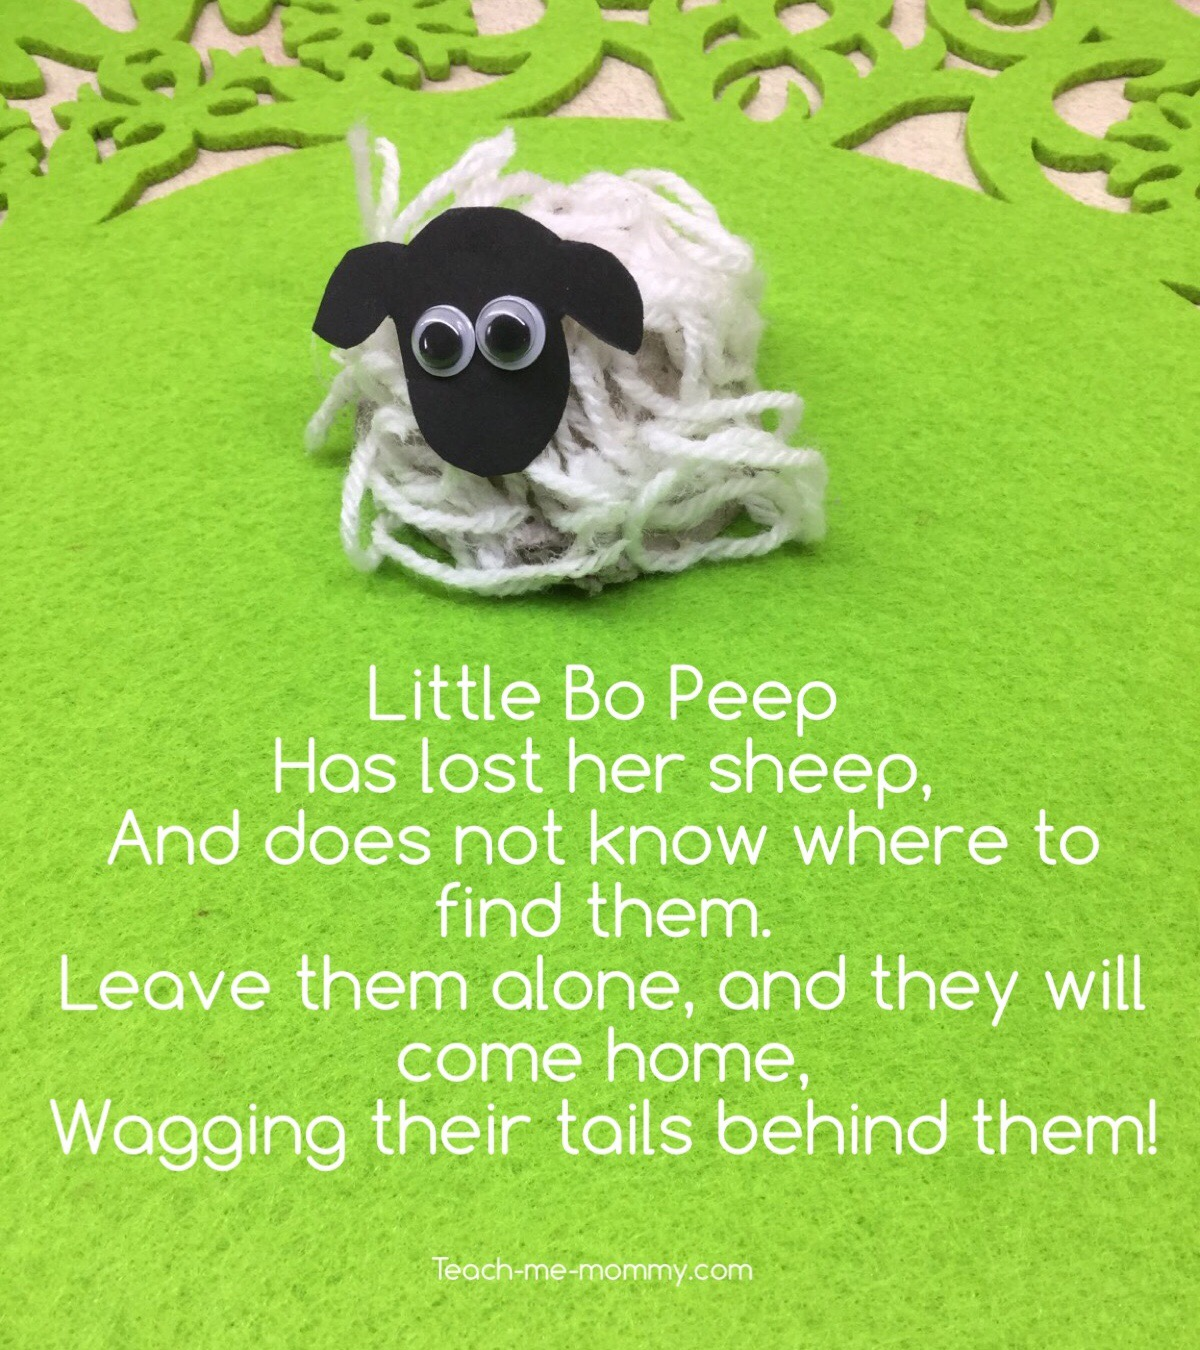 little bo peep rhyme